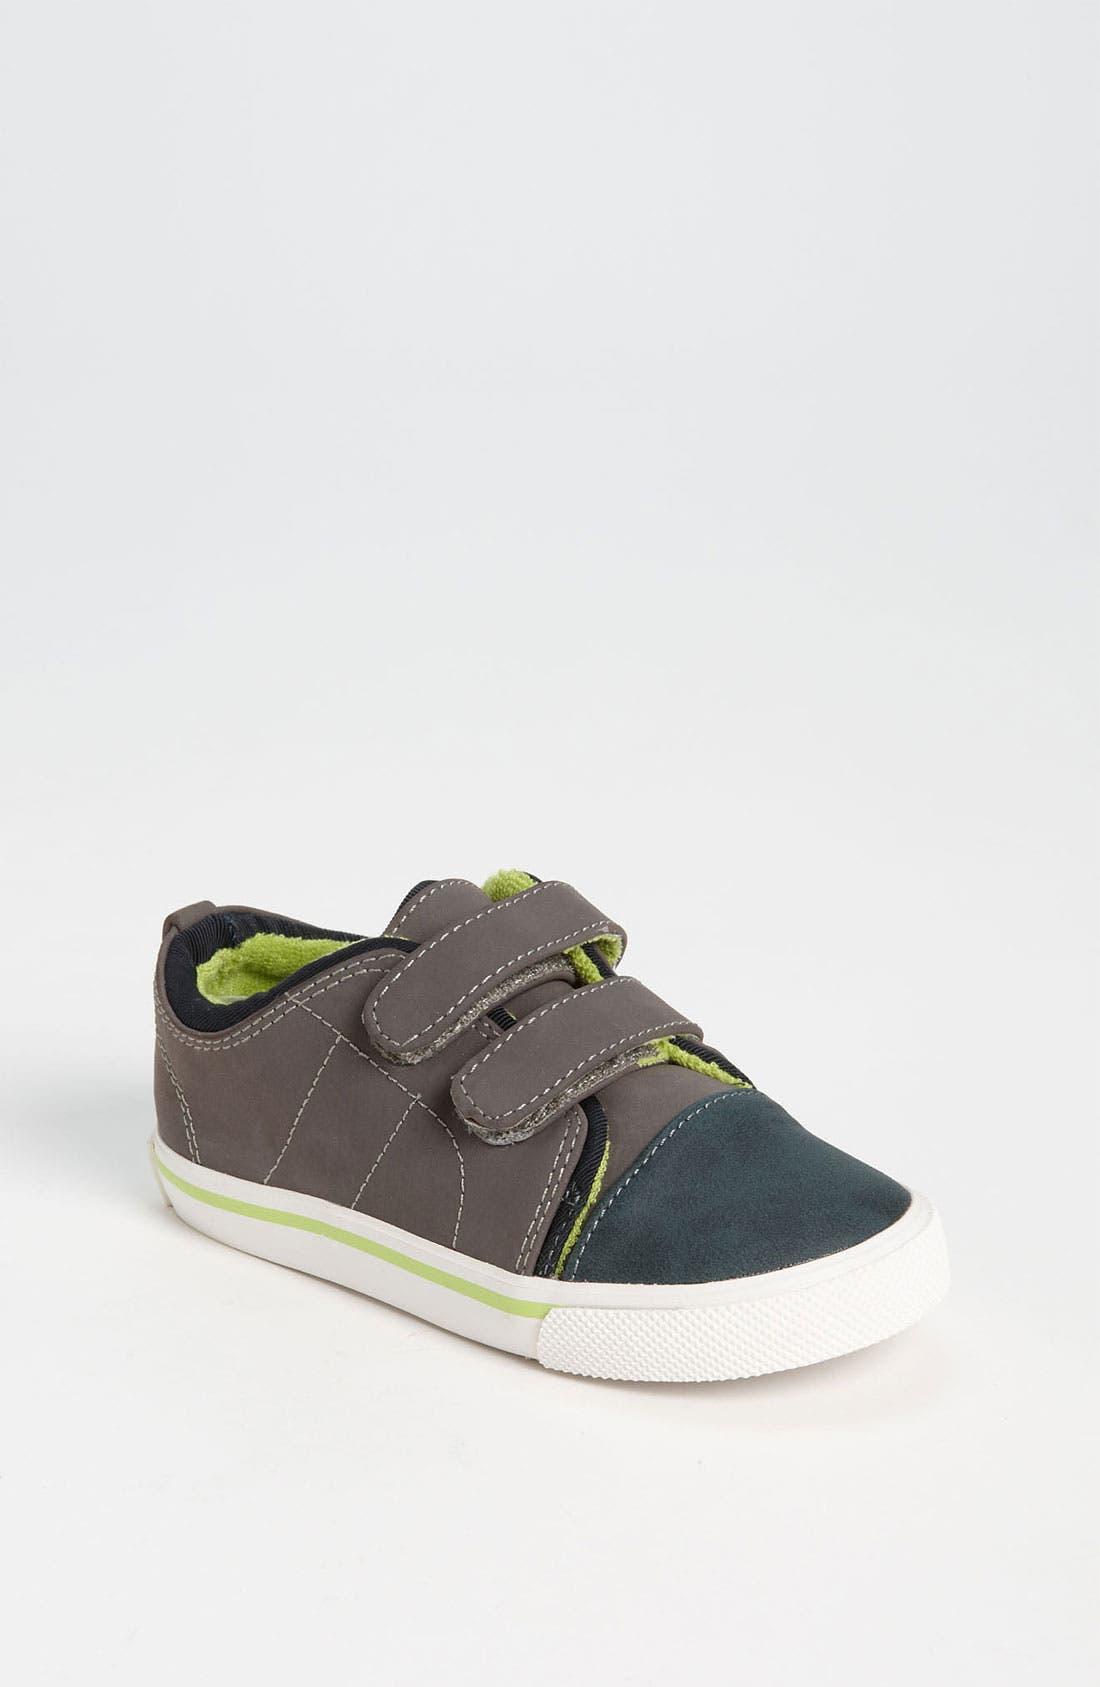 Main Image - Cole Haan 'Air Cory 2' Sneaker (Walker & Toddler)